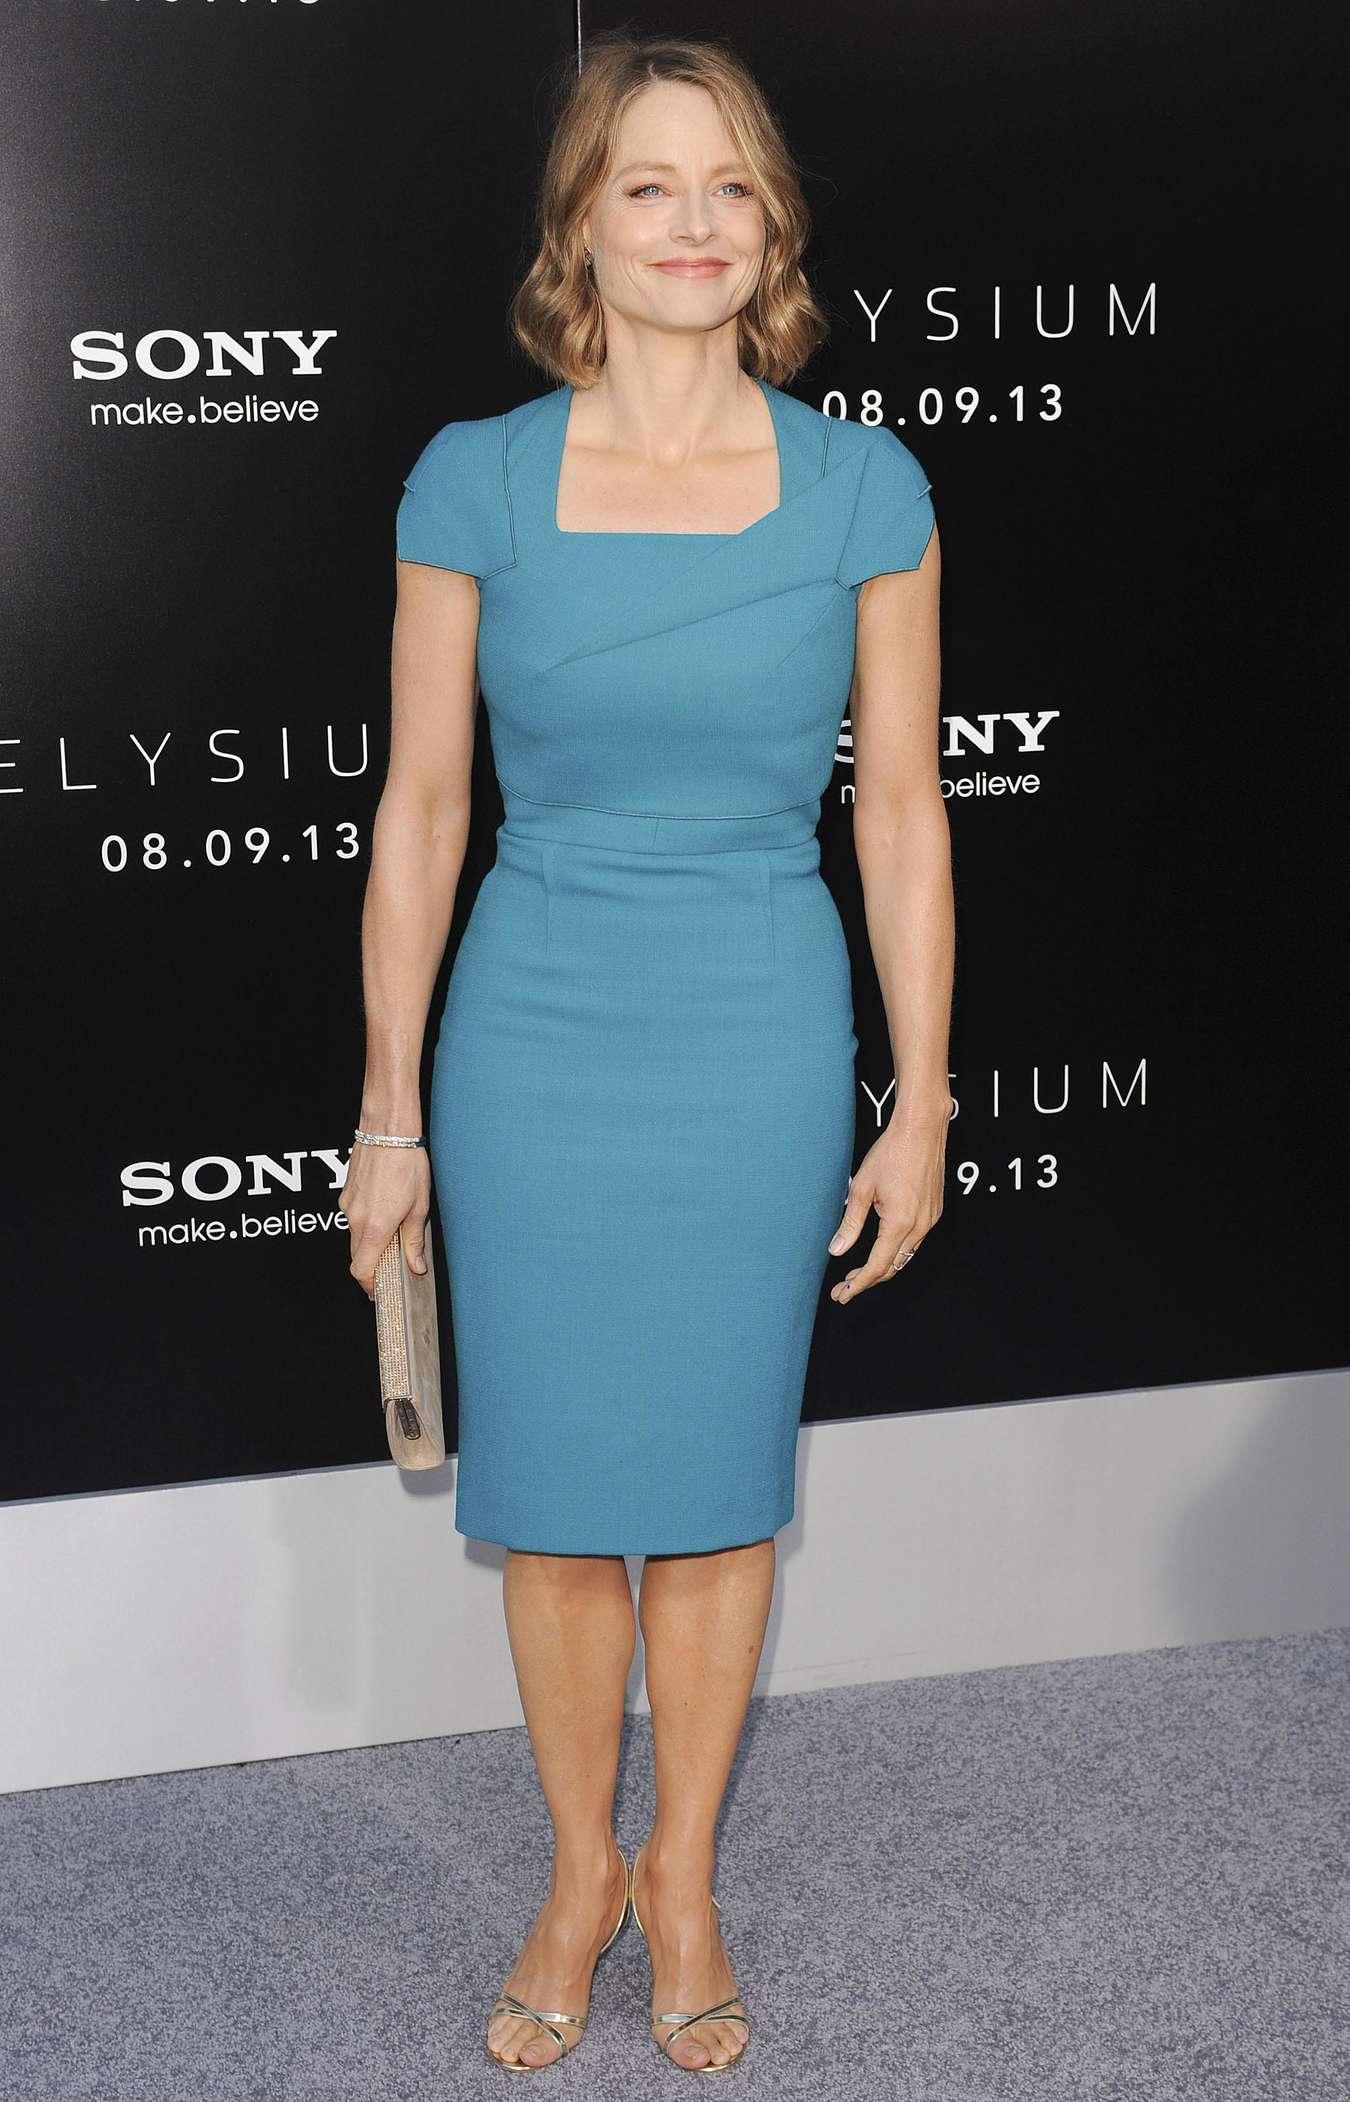 Jodie Foster at Film Premiere of Elysium